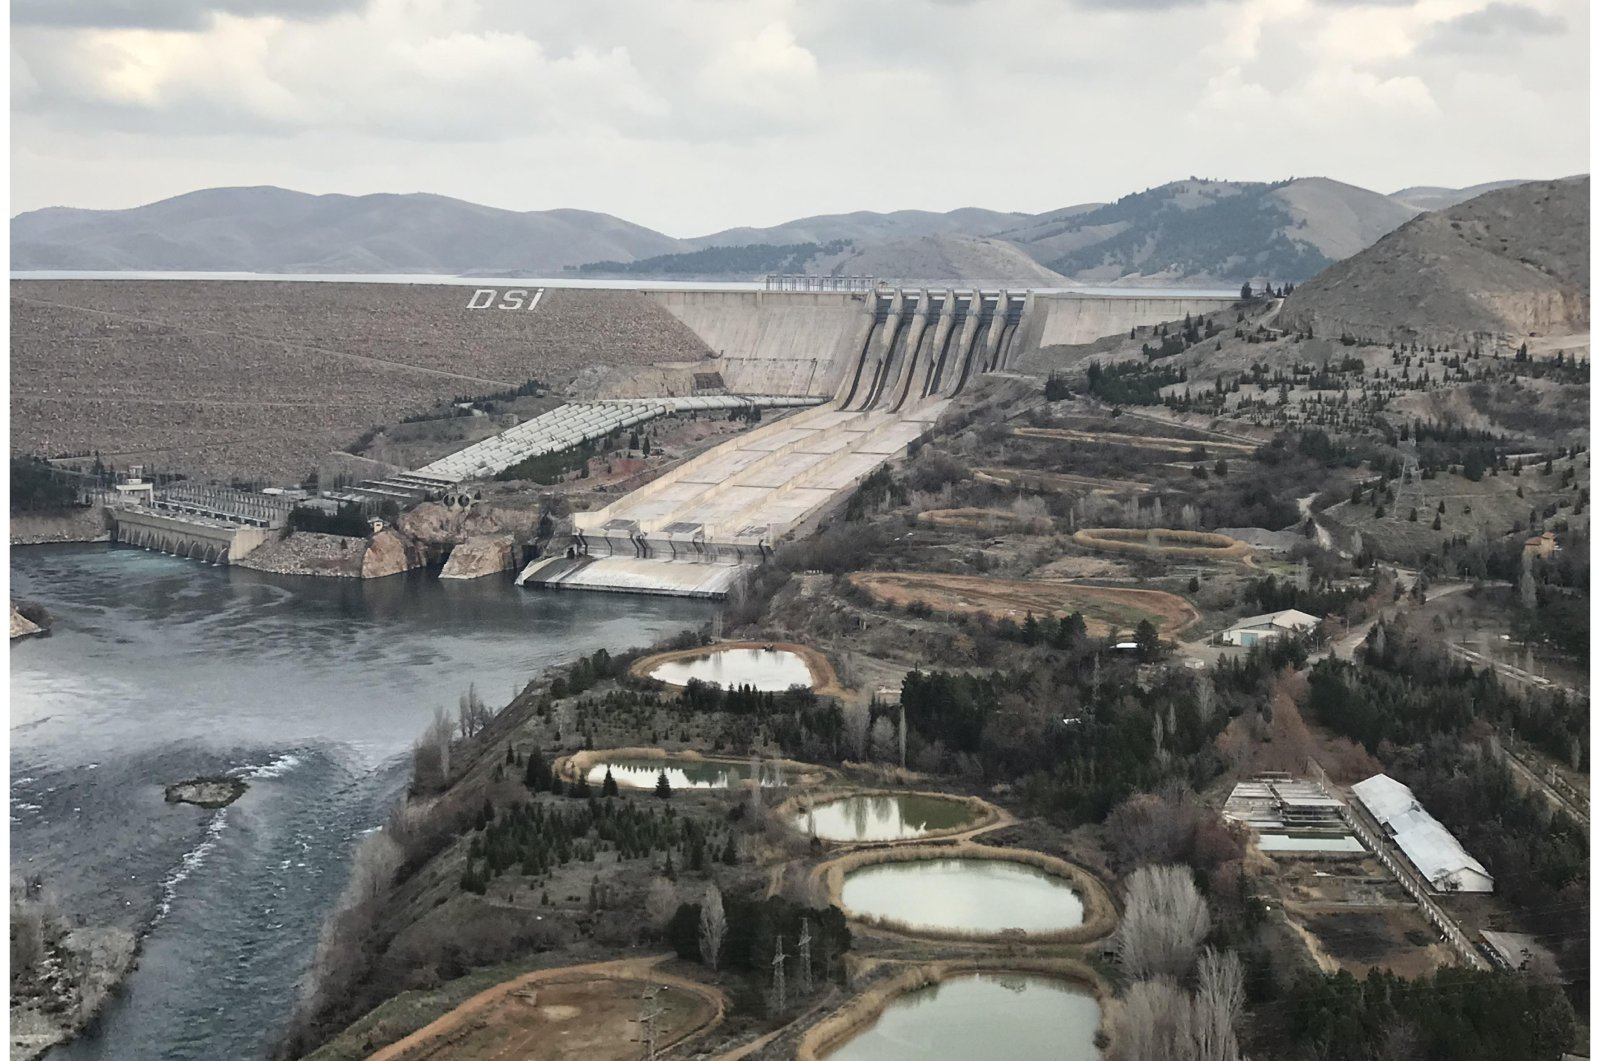 A view of Keban Dam and hydroelectric power plantin the eastern province of Elazığ, Turkey, Jan. 25, 2021. (AA Photo)